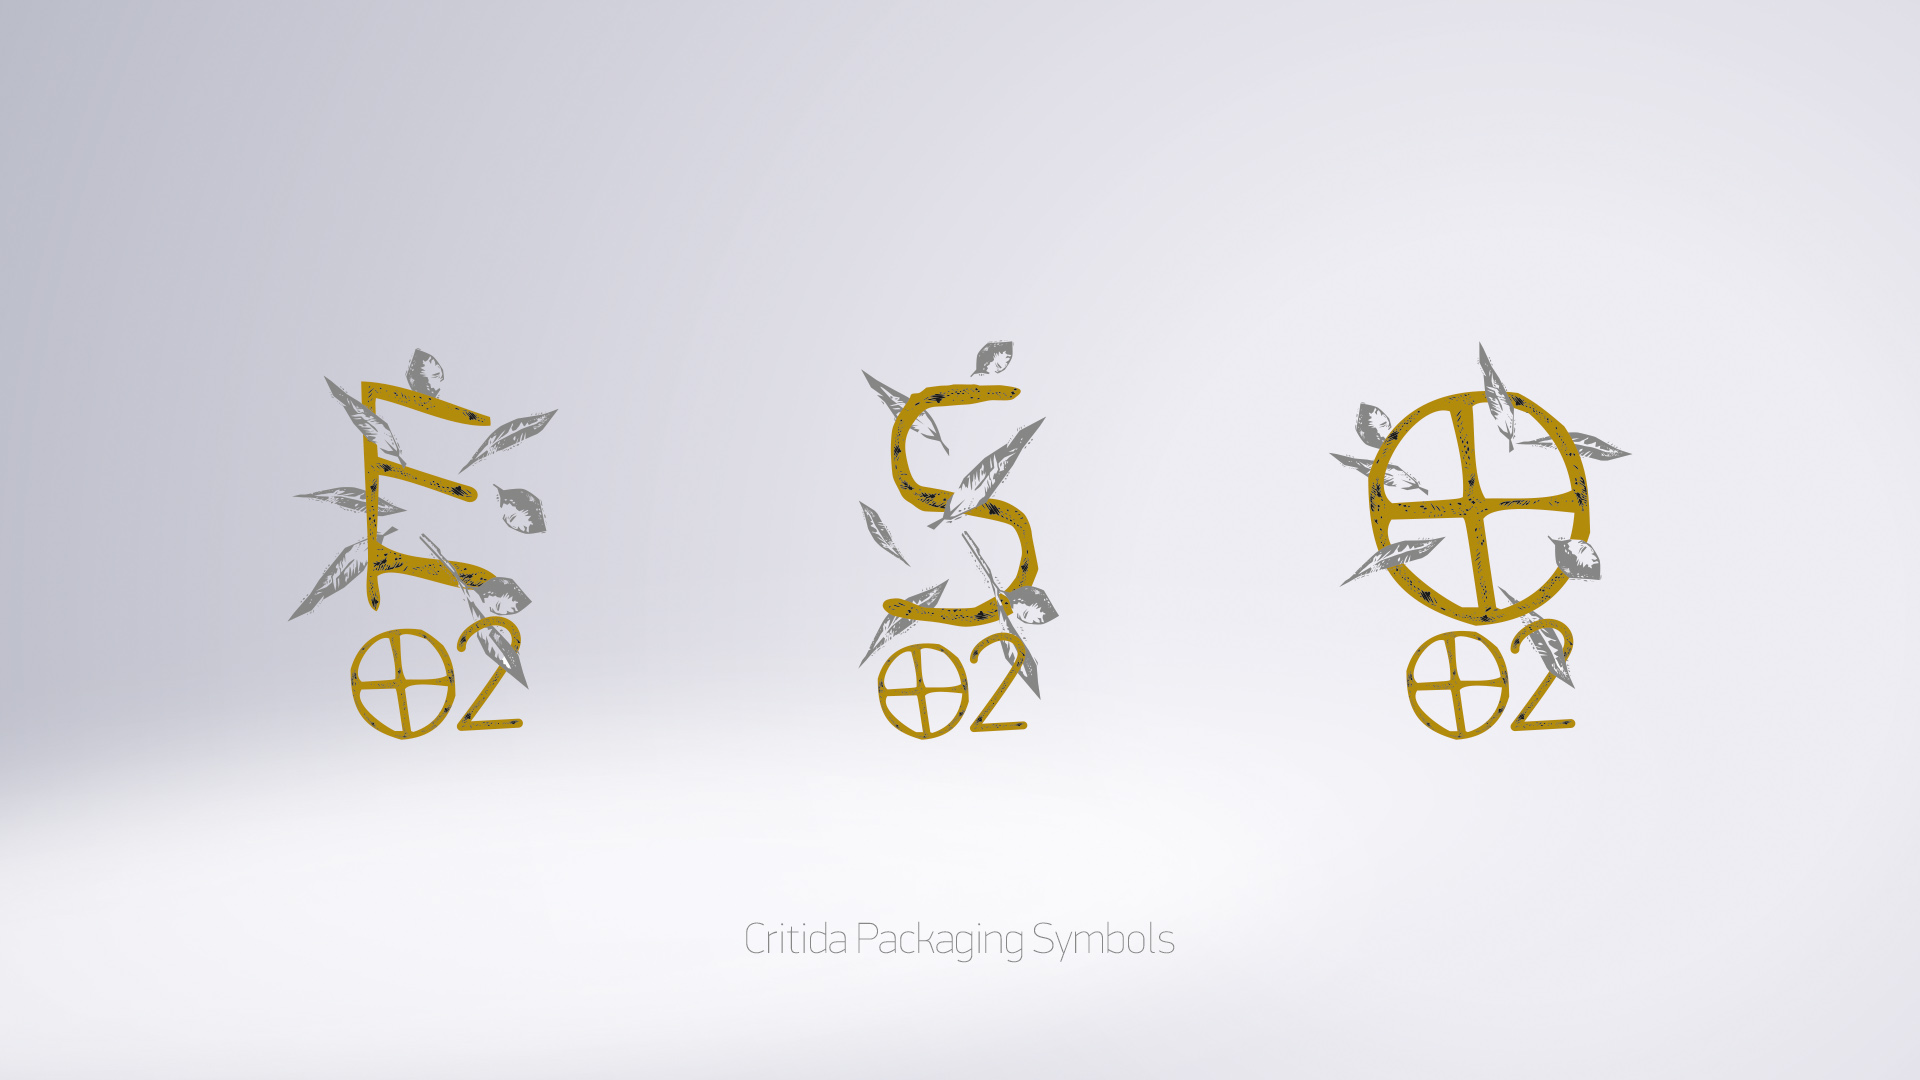 Critida Logo